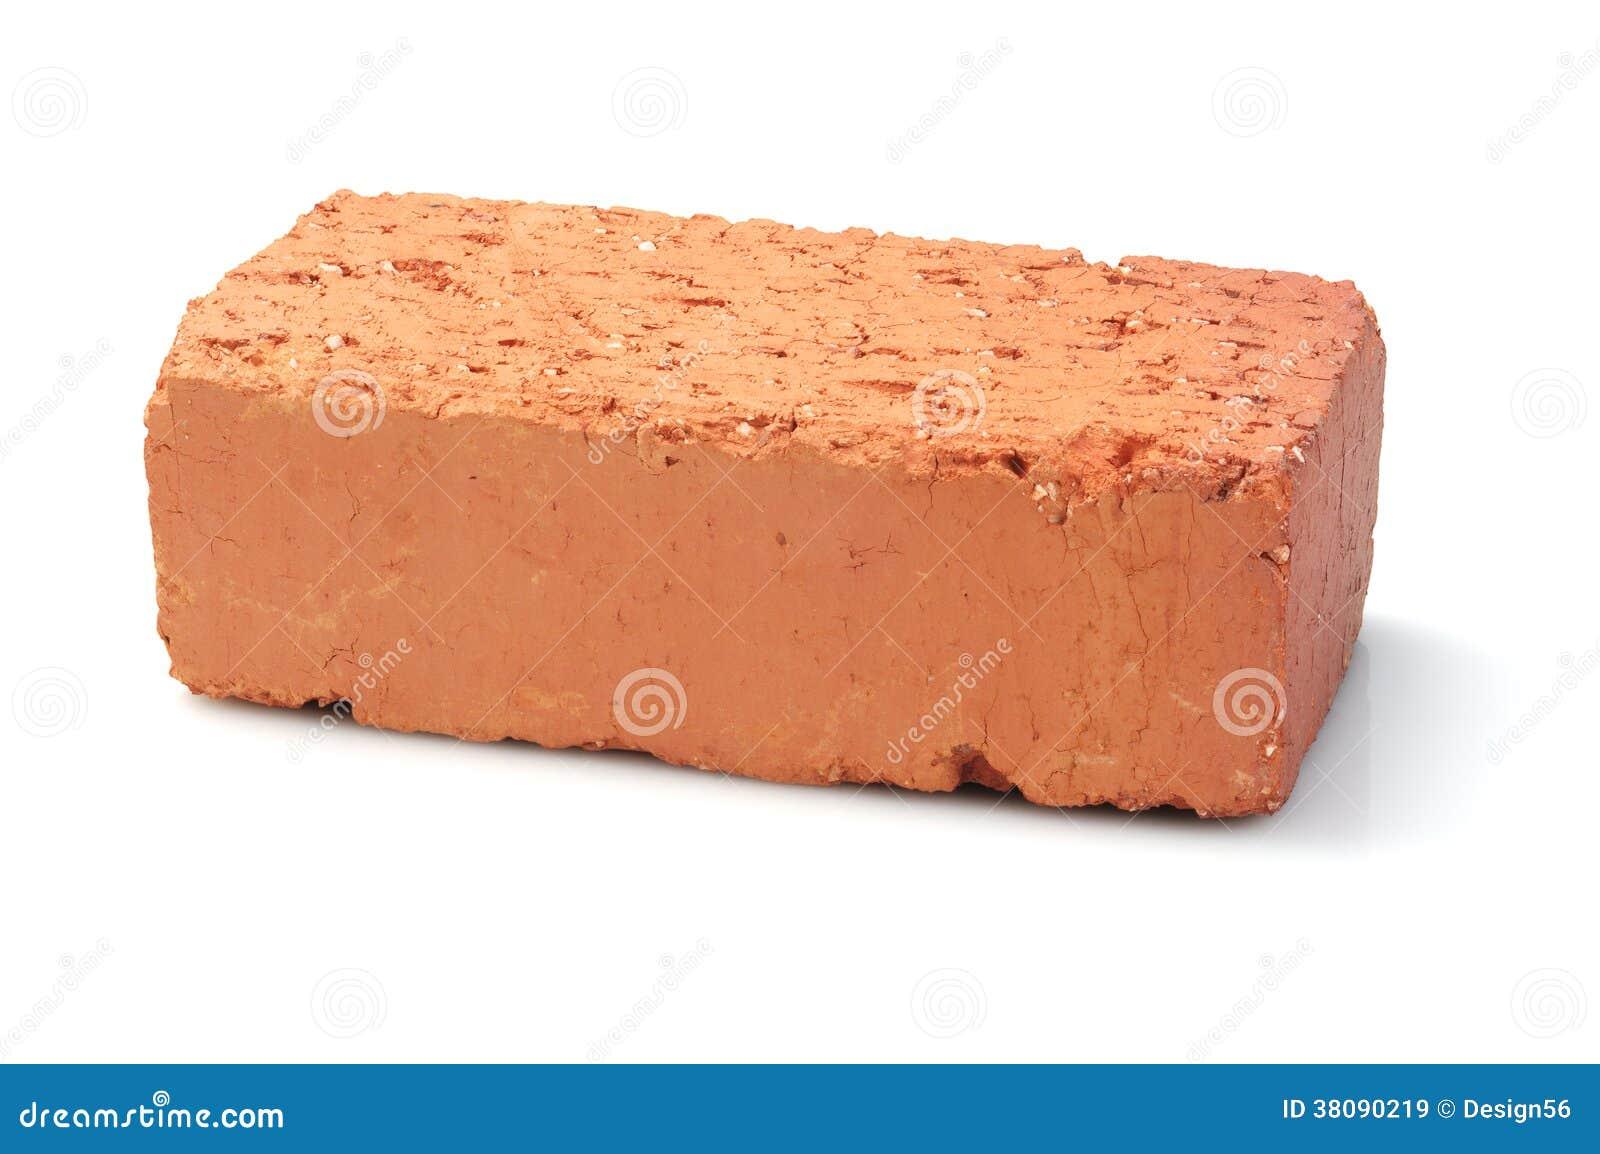 Red Clay Bricks : Red clay brick stock photo cartoondealer